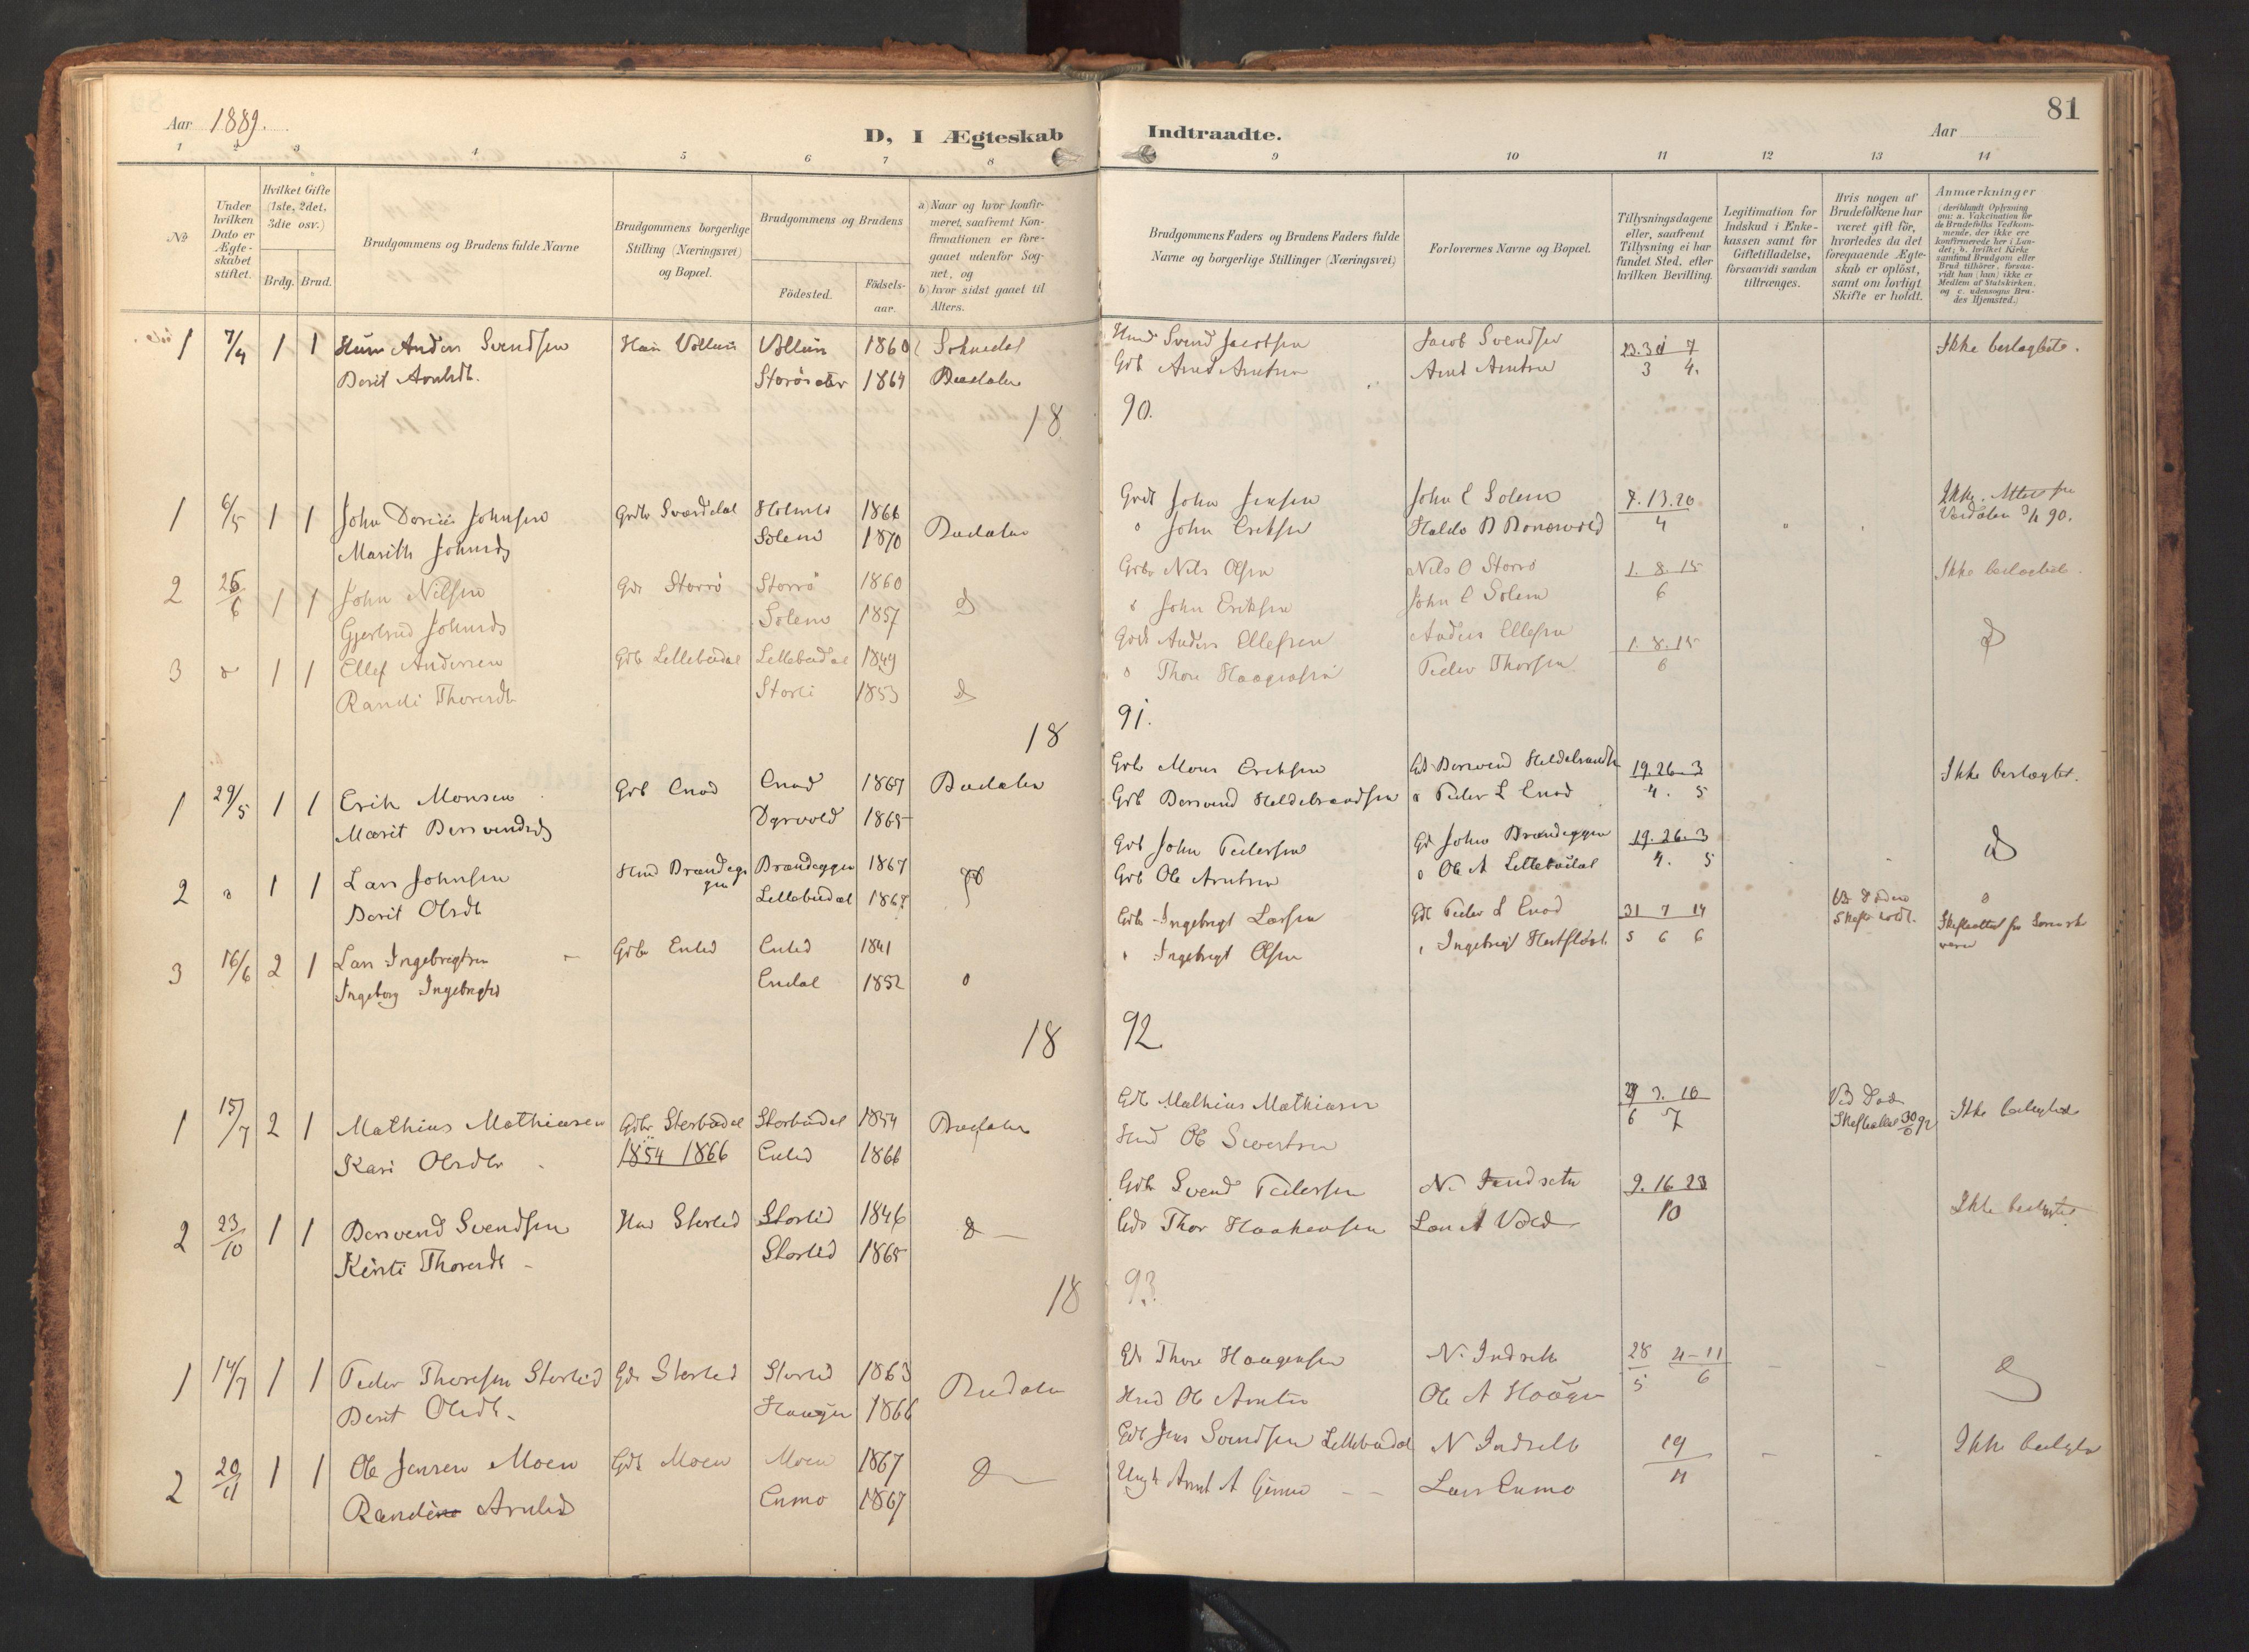 SAT, Ministerialprotokoller, klokkerbøker og fødselsregistre - Sør-Trøndelag, 690/L1050: Parish register (official) no. 690A01, 1889-1929, p. 81